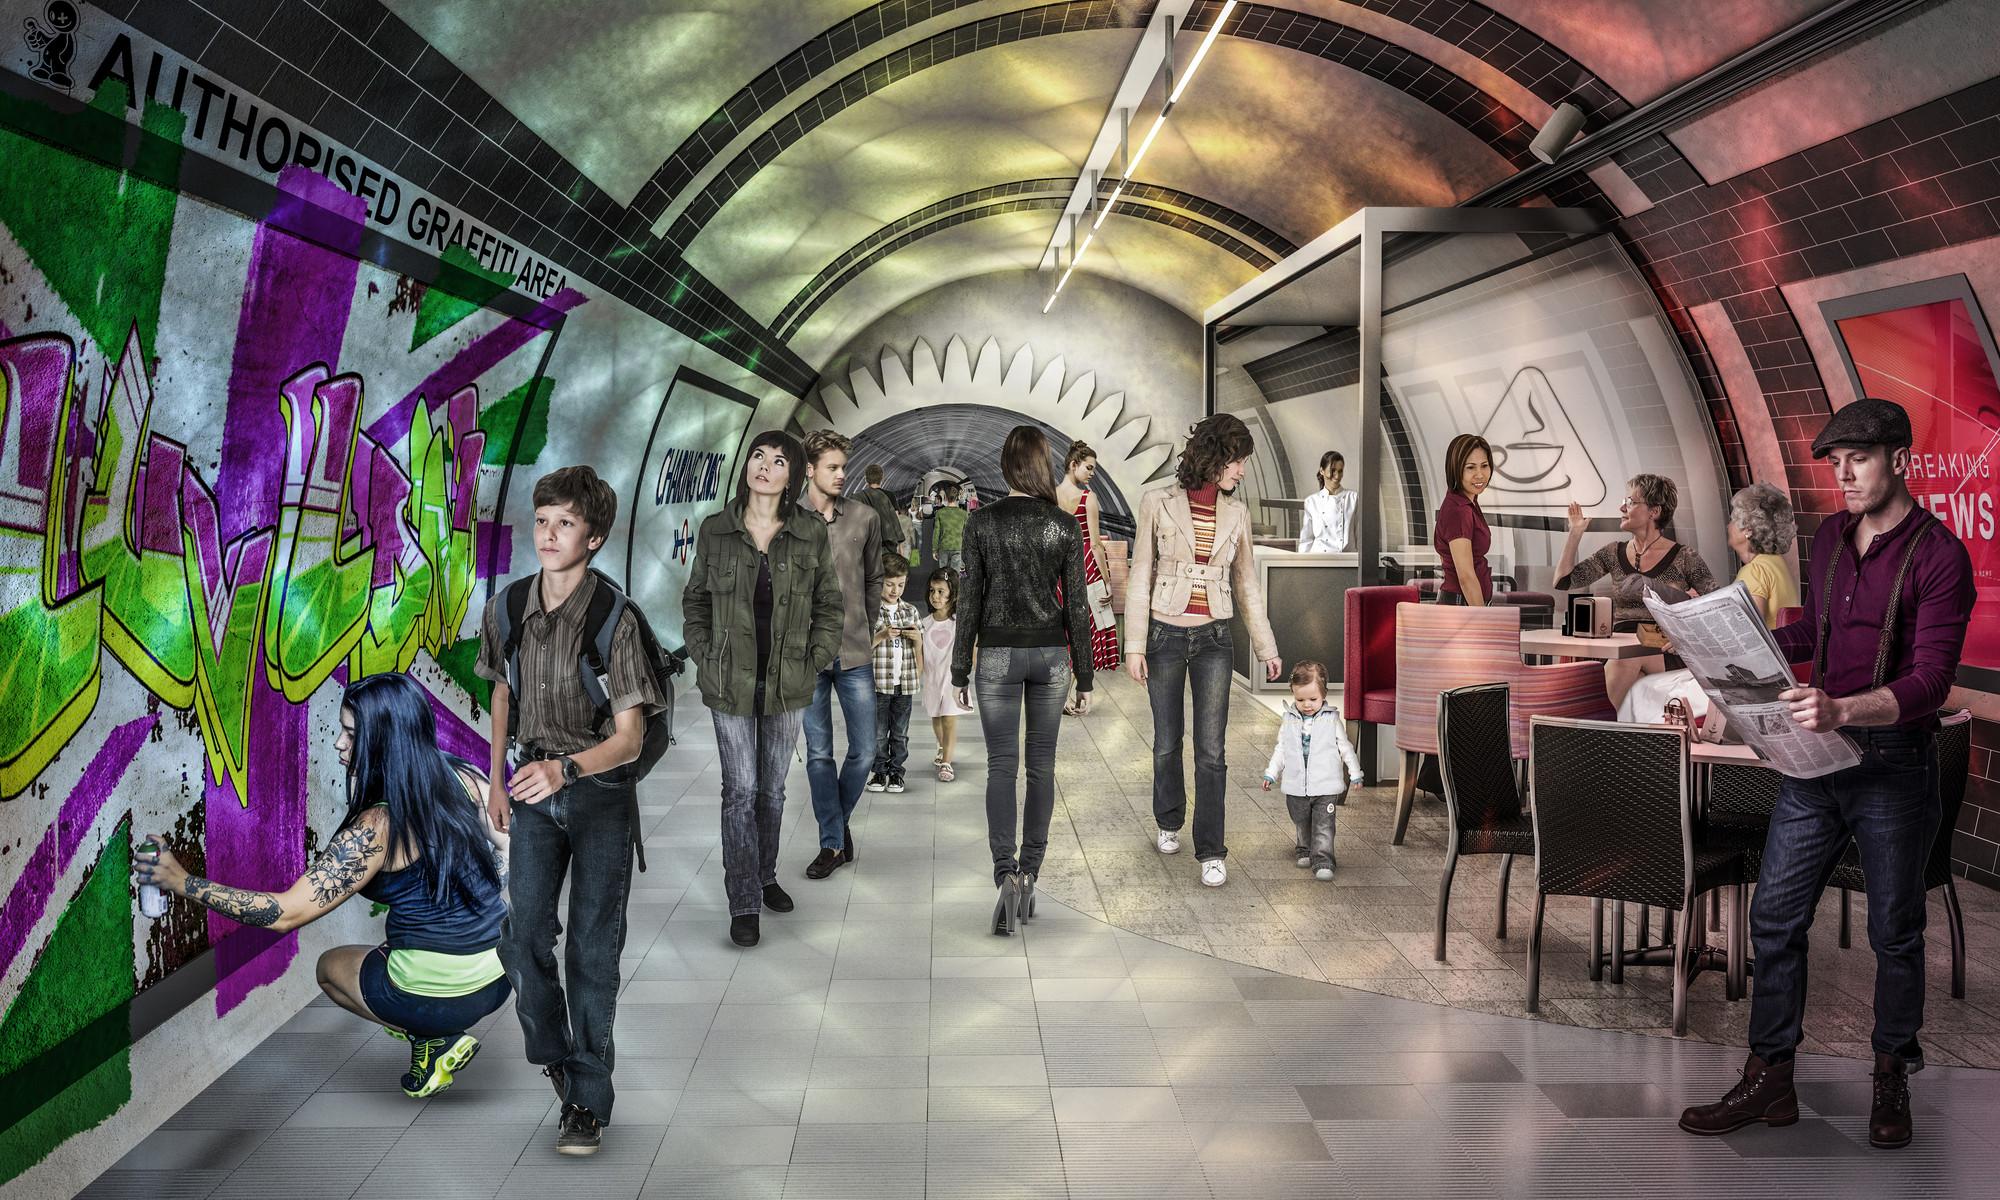 London Underline: Gensler Envisions Subterranean Transportation Network for London, Pedestrian Tunnel. Image Courtesy of Gensler